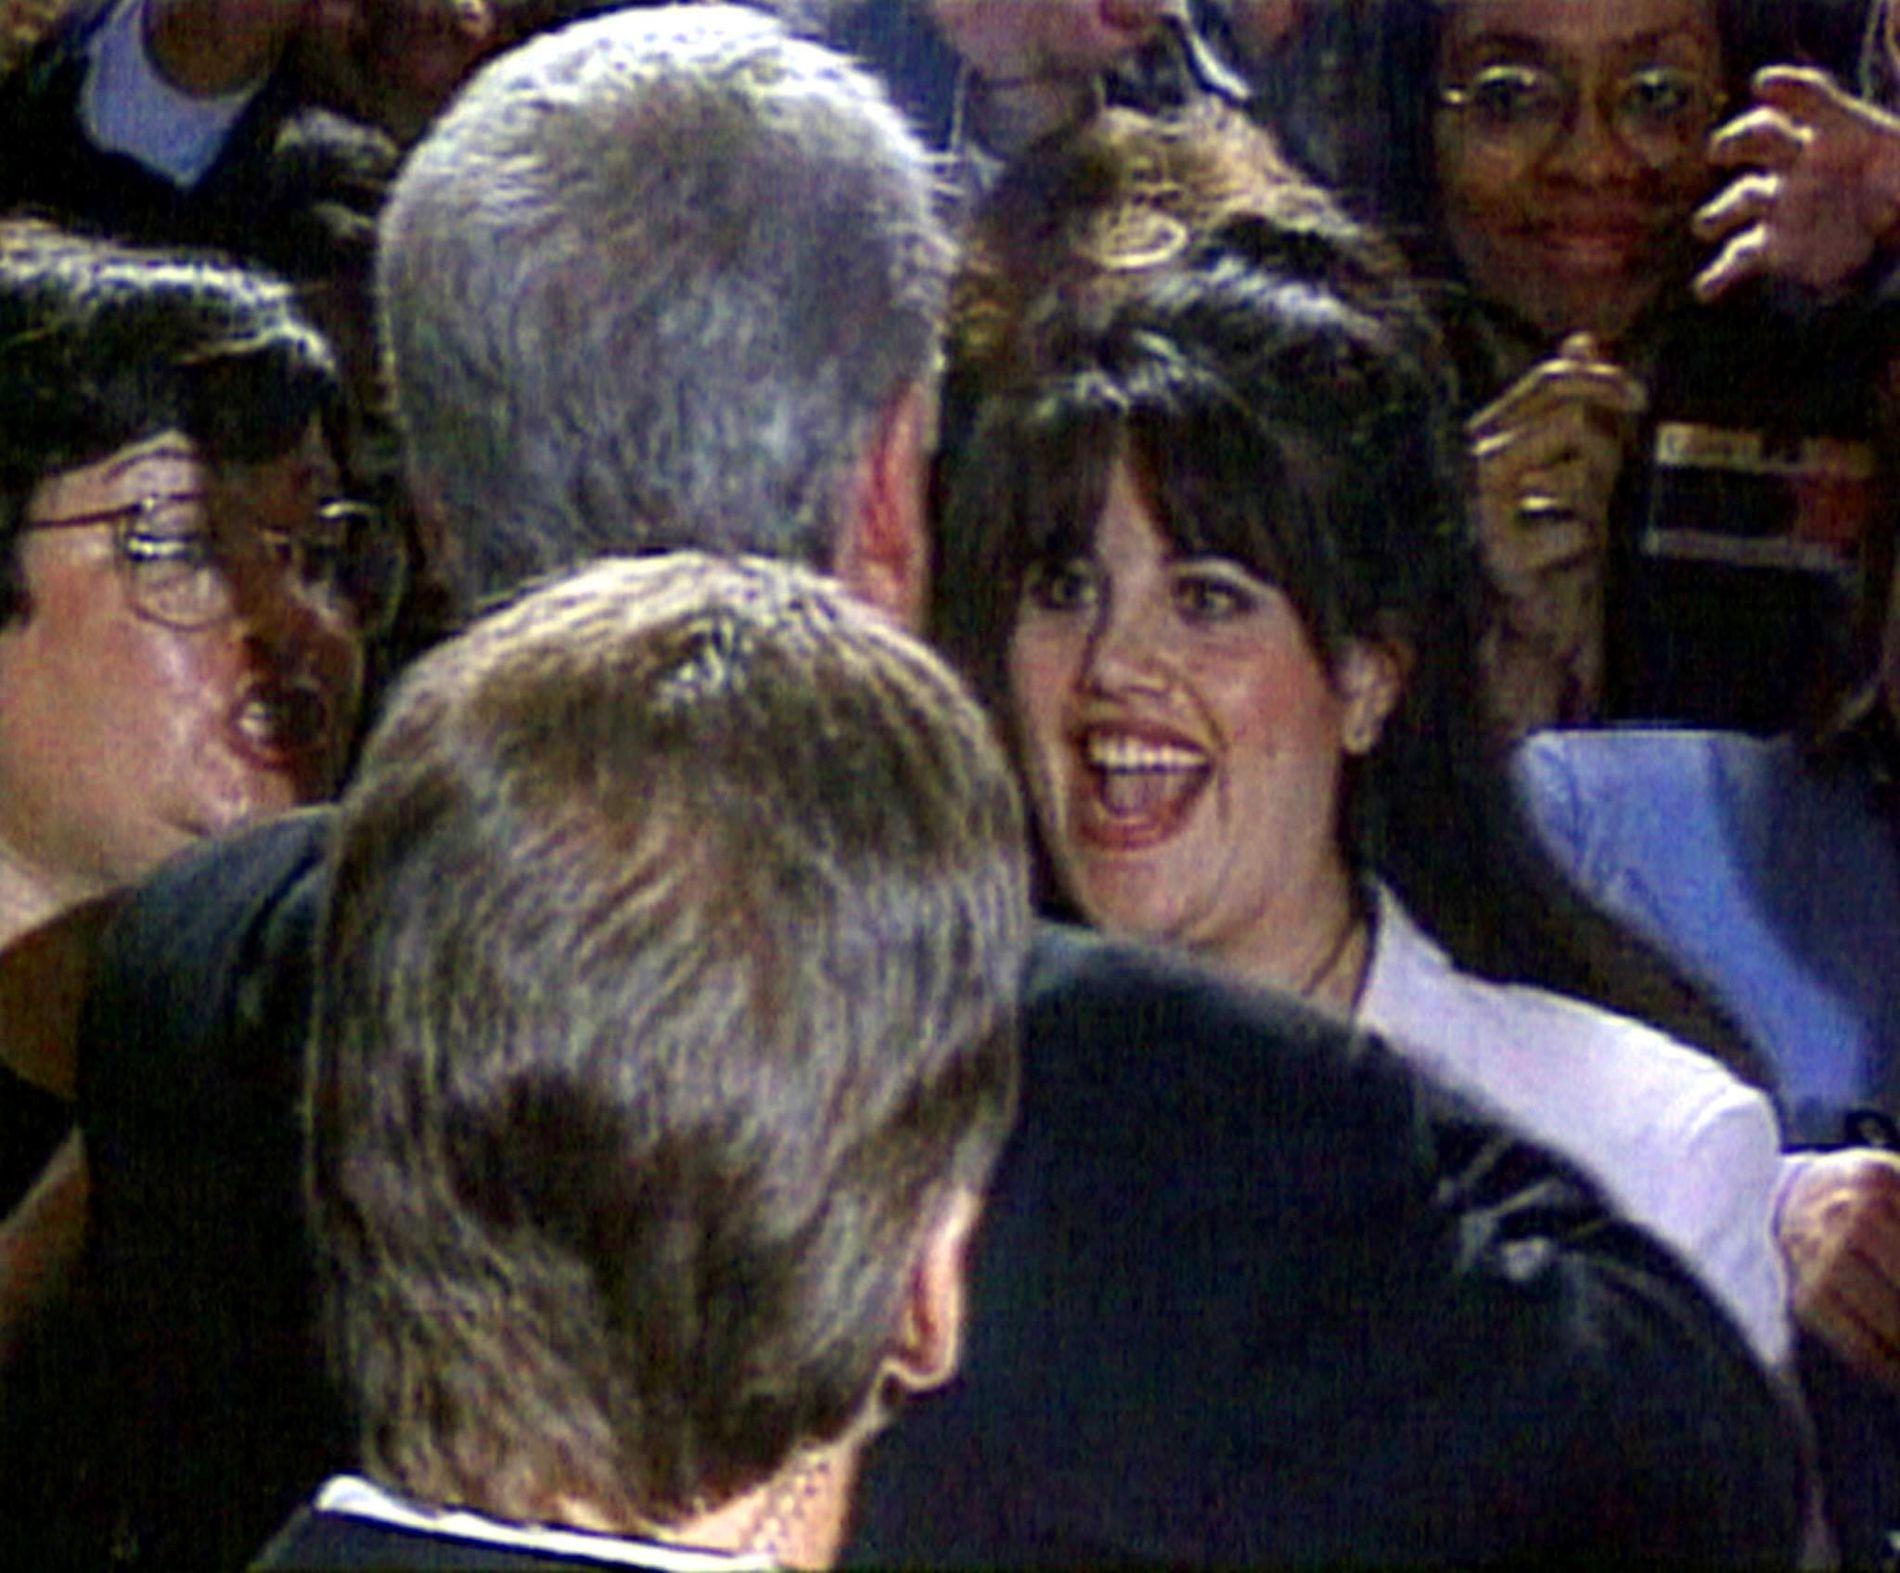 1998: Bill Clinton og Monica Lewinsky på en veldedighetsgalla i Washington.